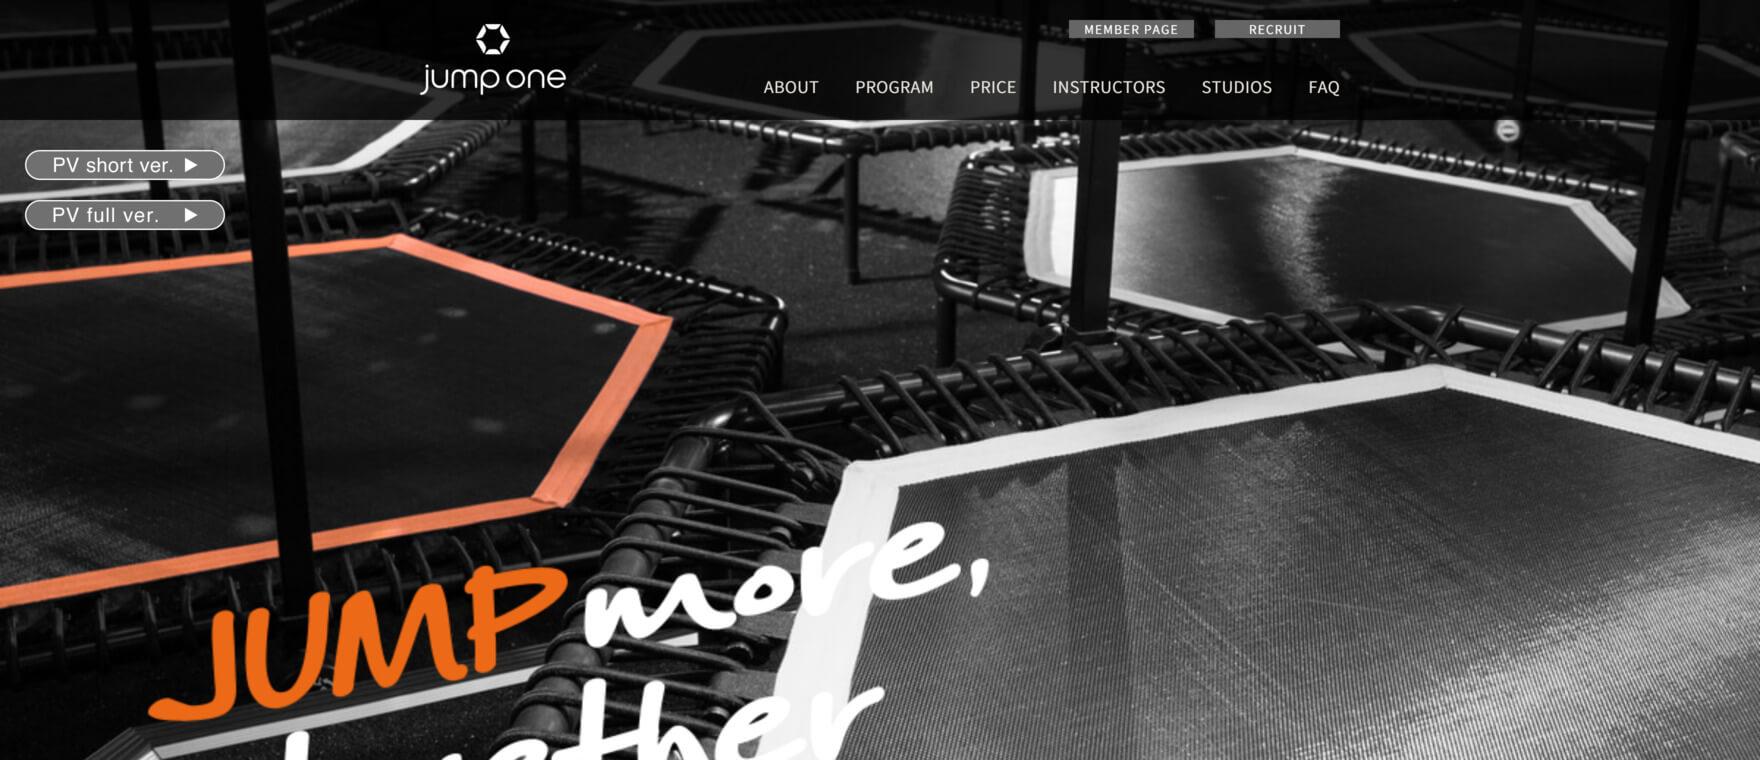 jump oneGinza4のイメージ画像